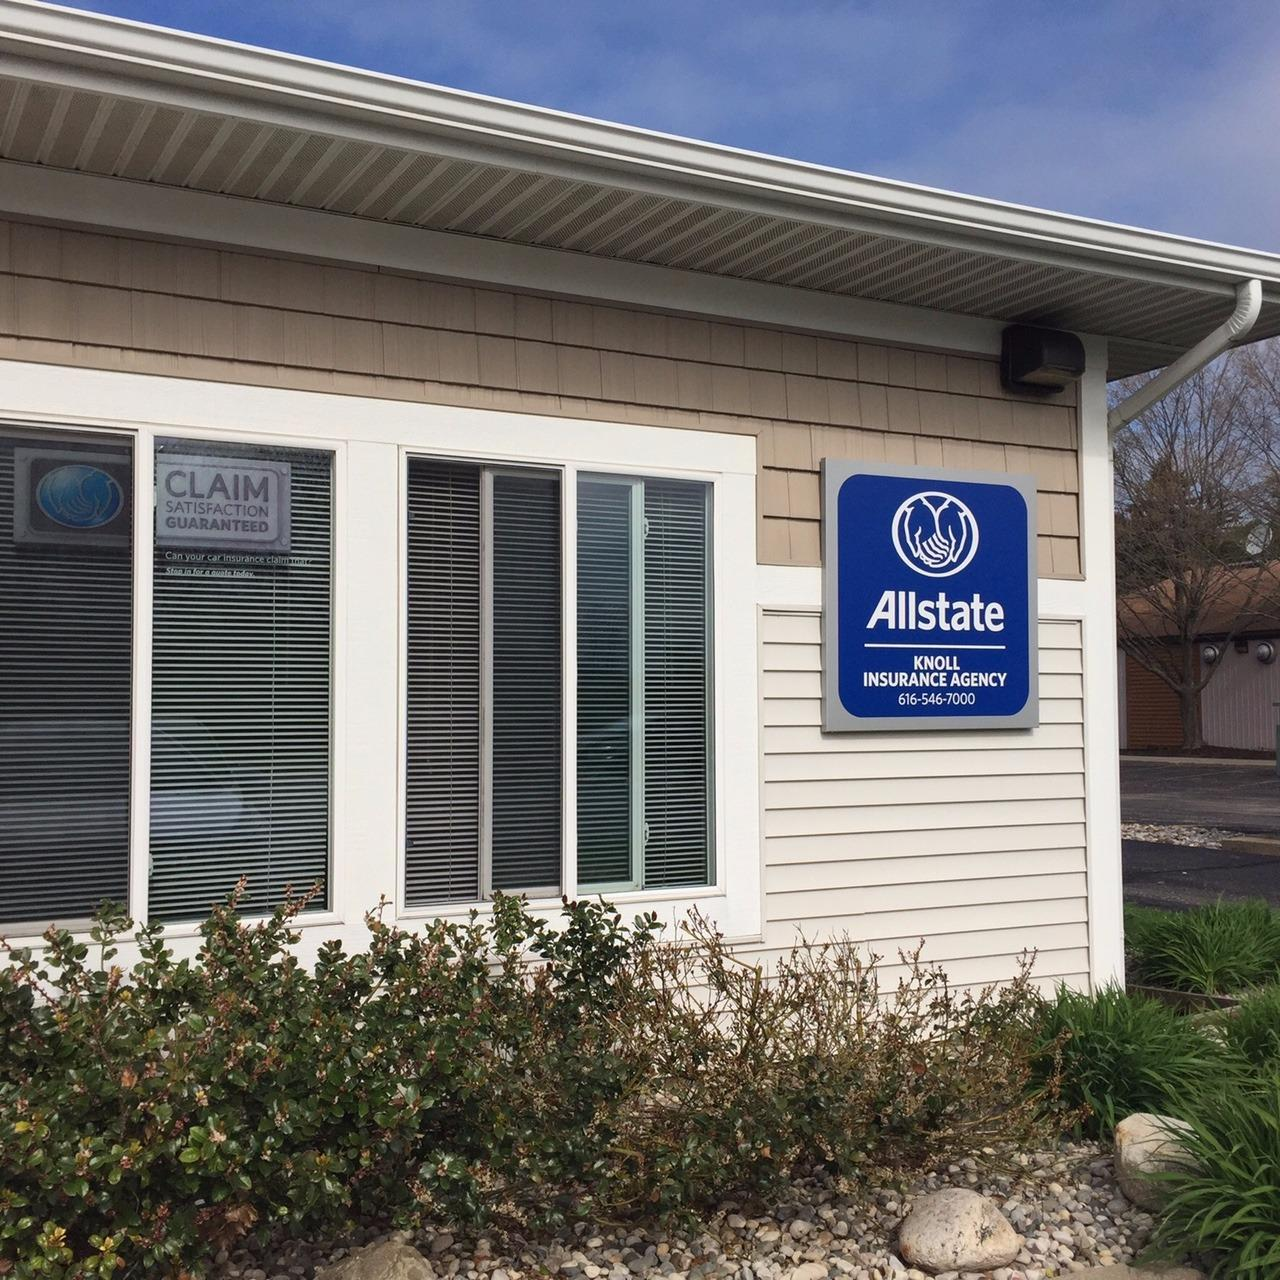 Allstate Insurance Agent: Krystal Knoll image 1